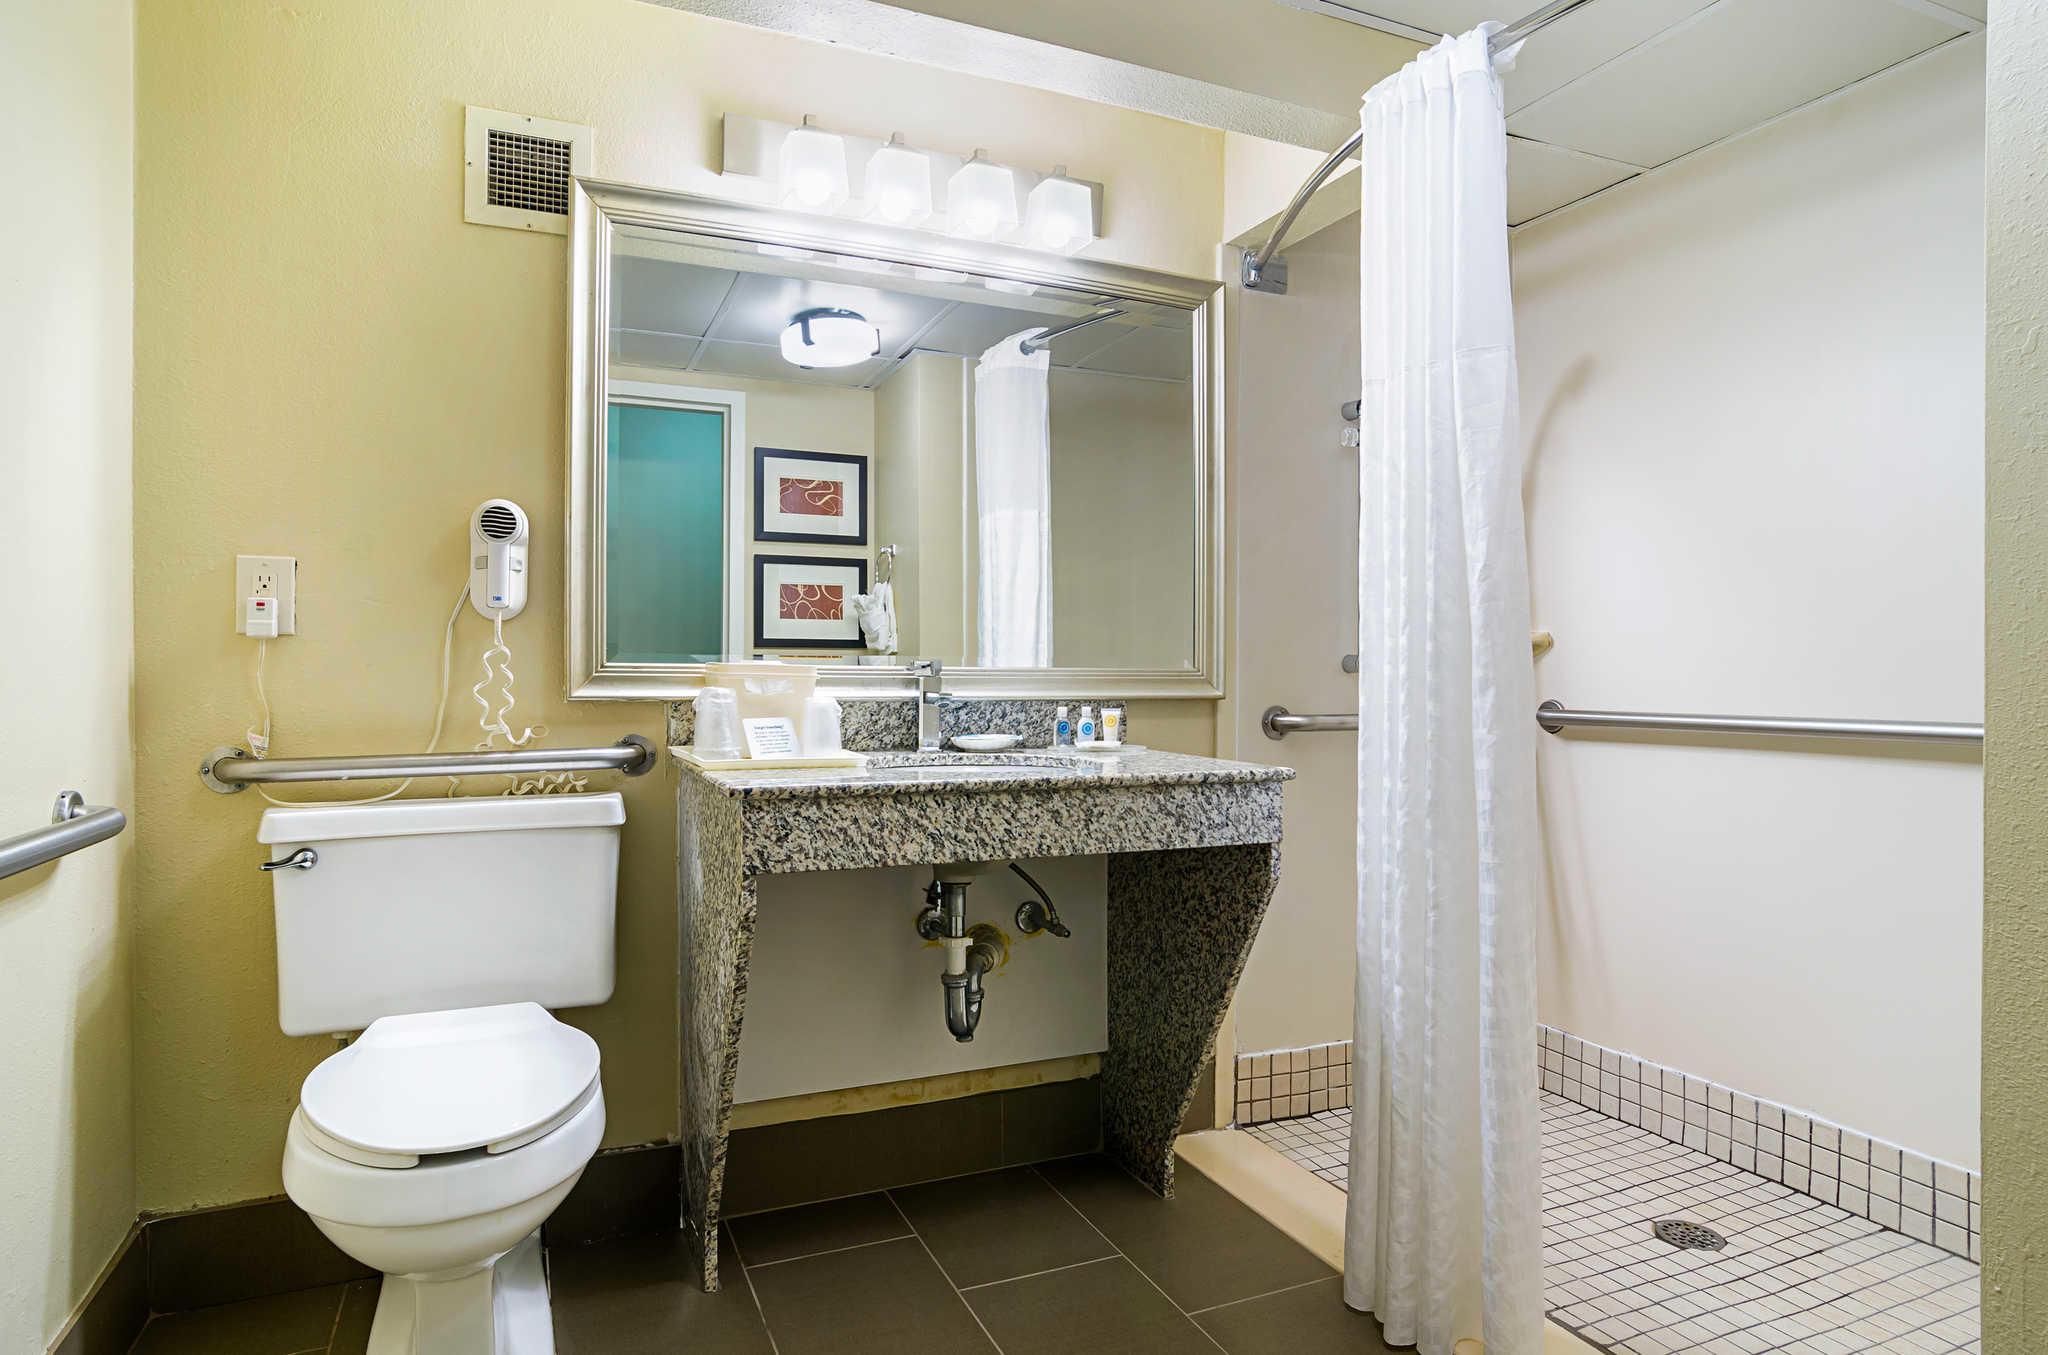 Comfort Inn & Suites Duke University-Downtown image 9